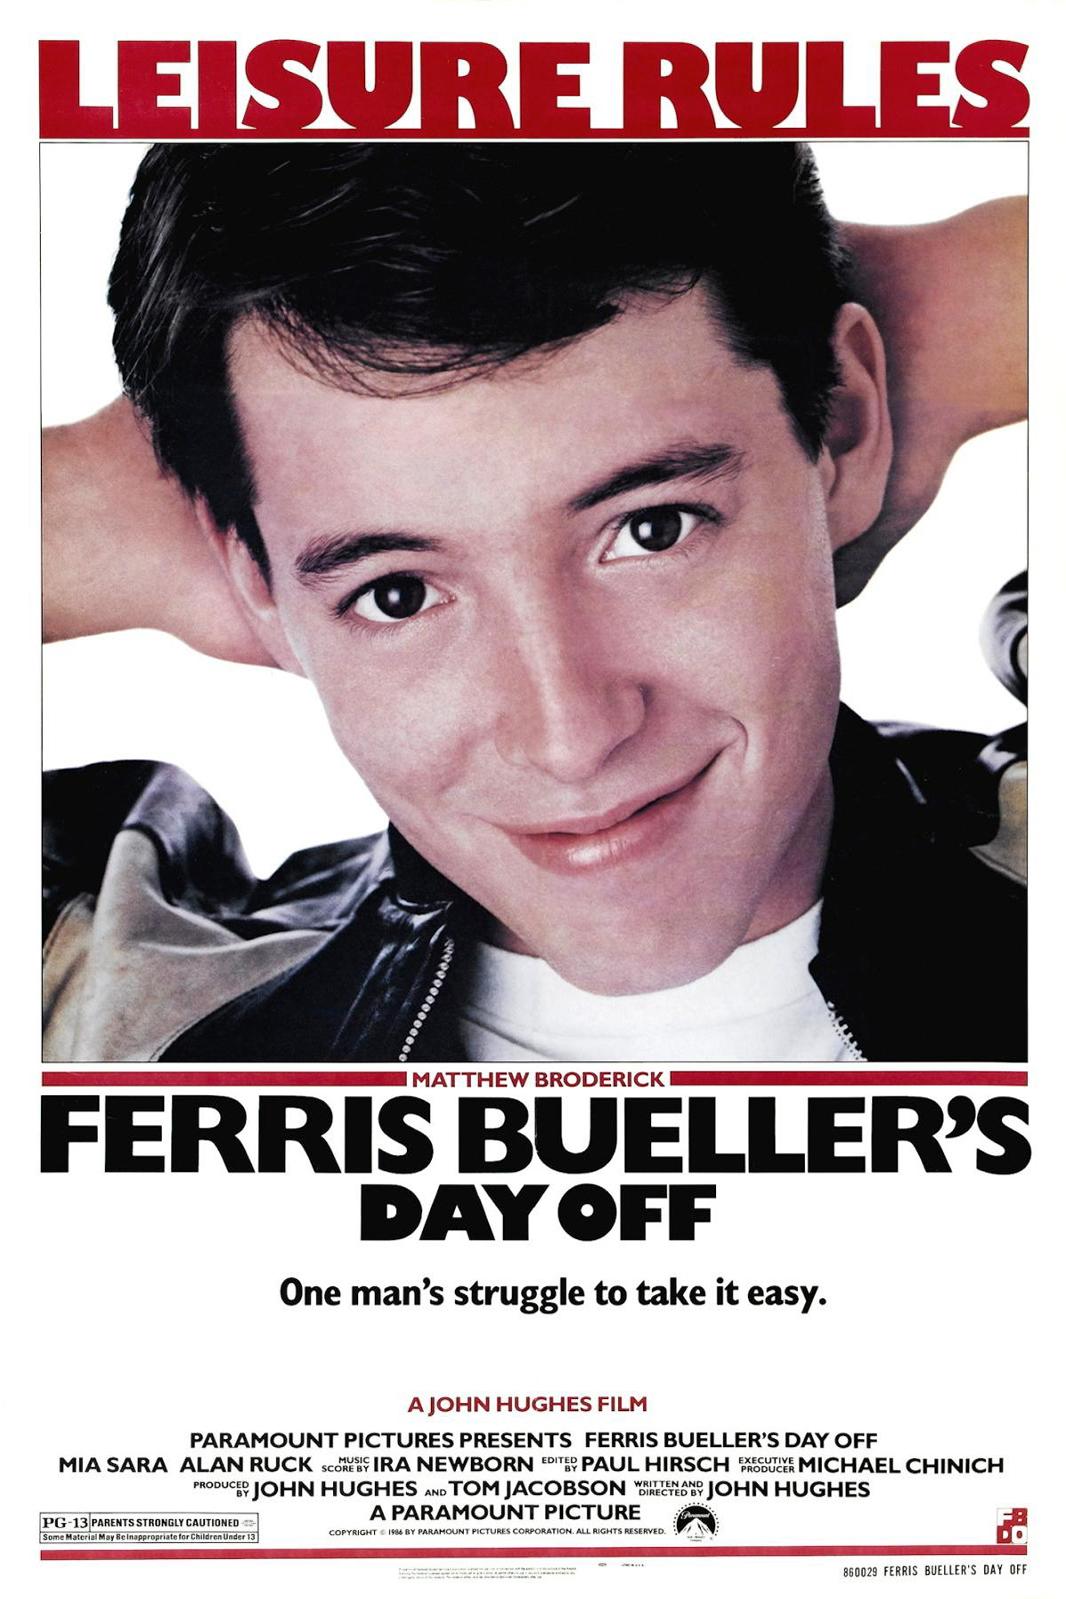 Poster for Ferris Bueller's Day Off